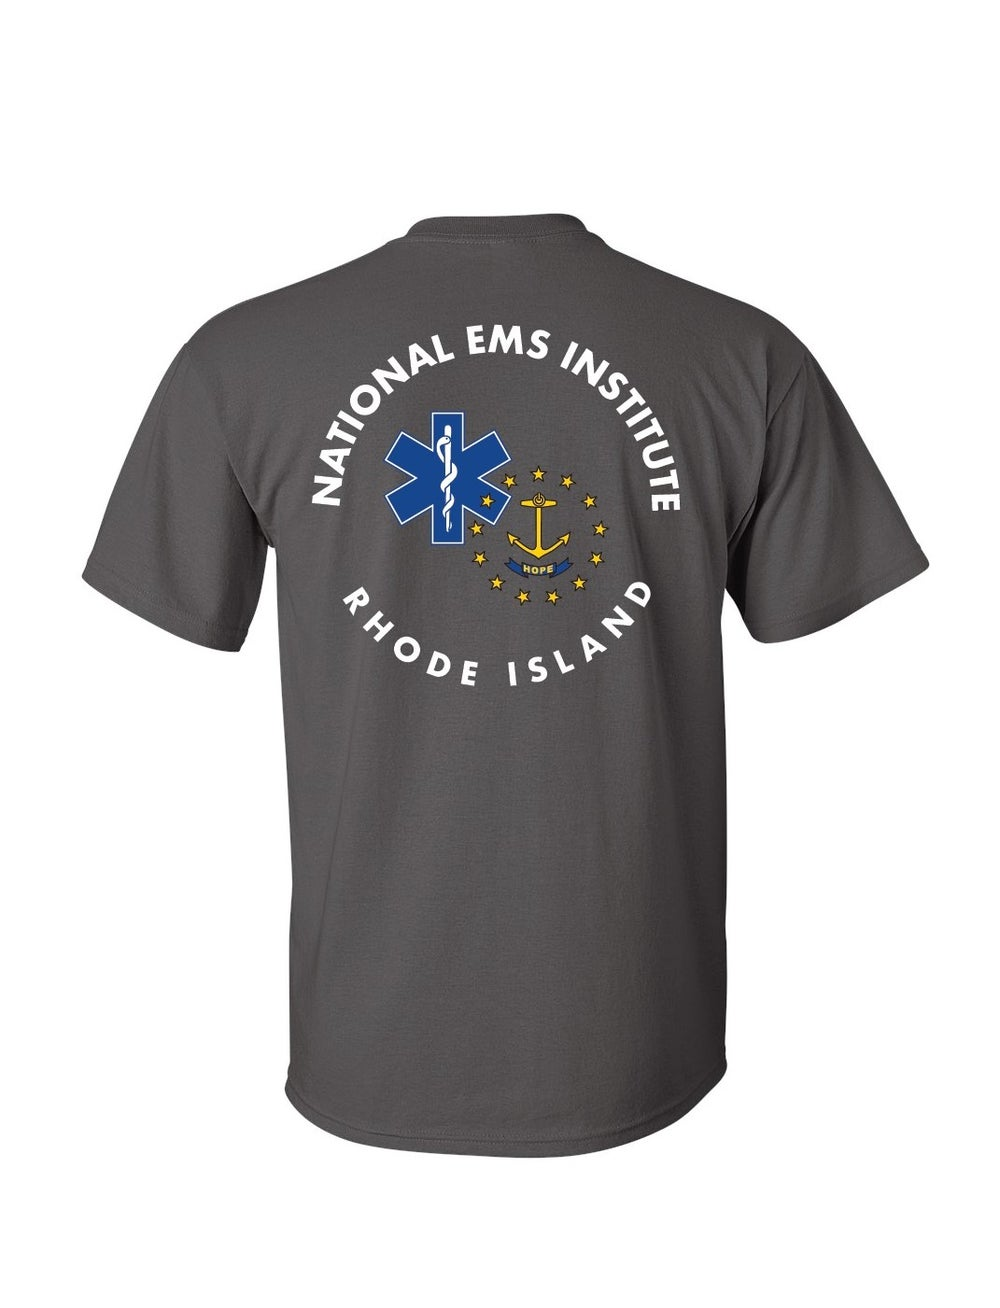 Image of NEMSI Rhode Island T-Shirt